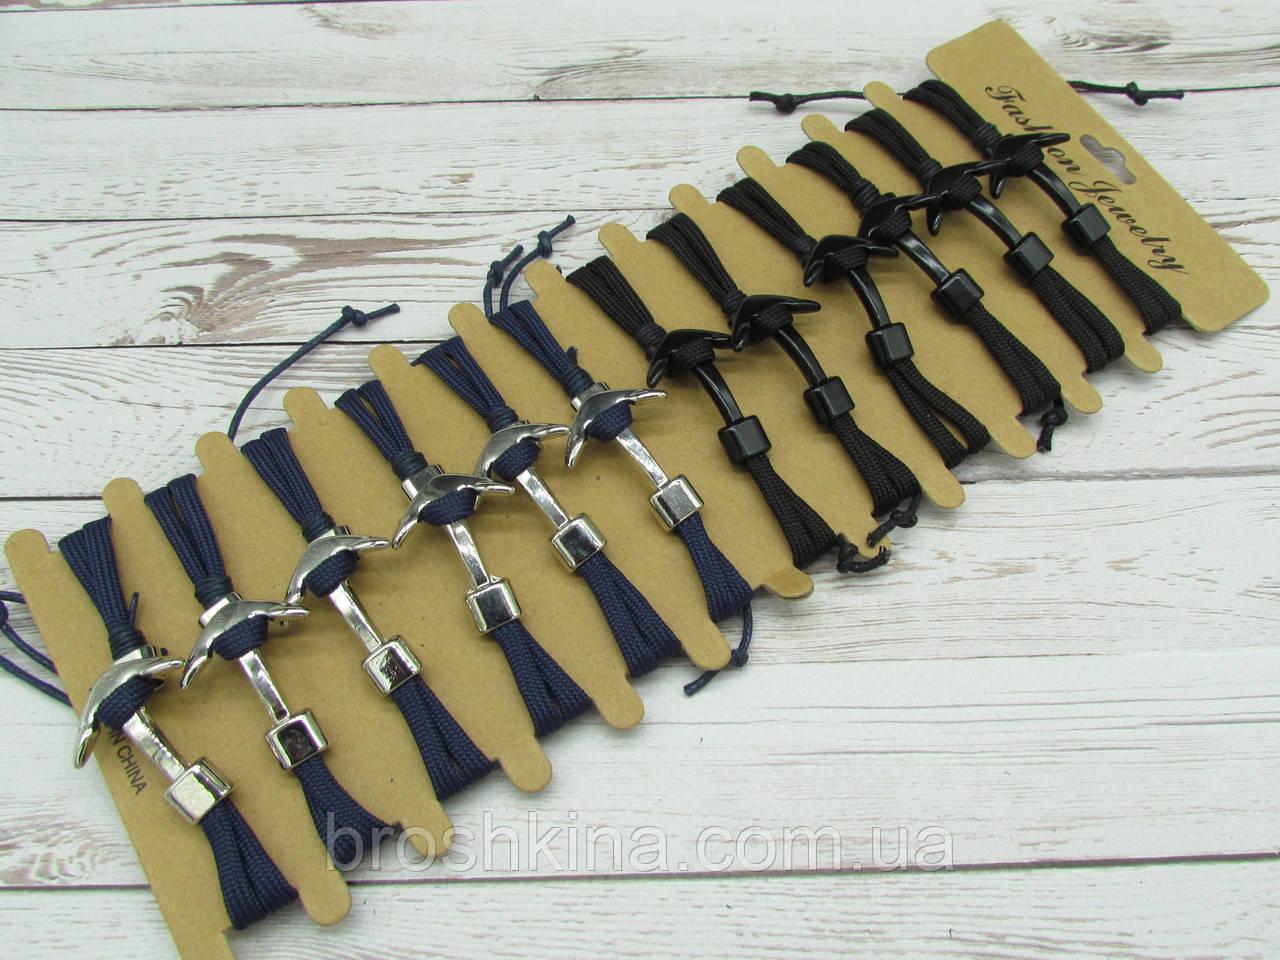 Мужские браслеты текстиль/металл 12 шт/уп.